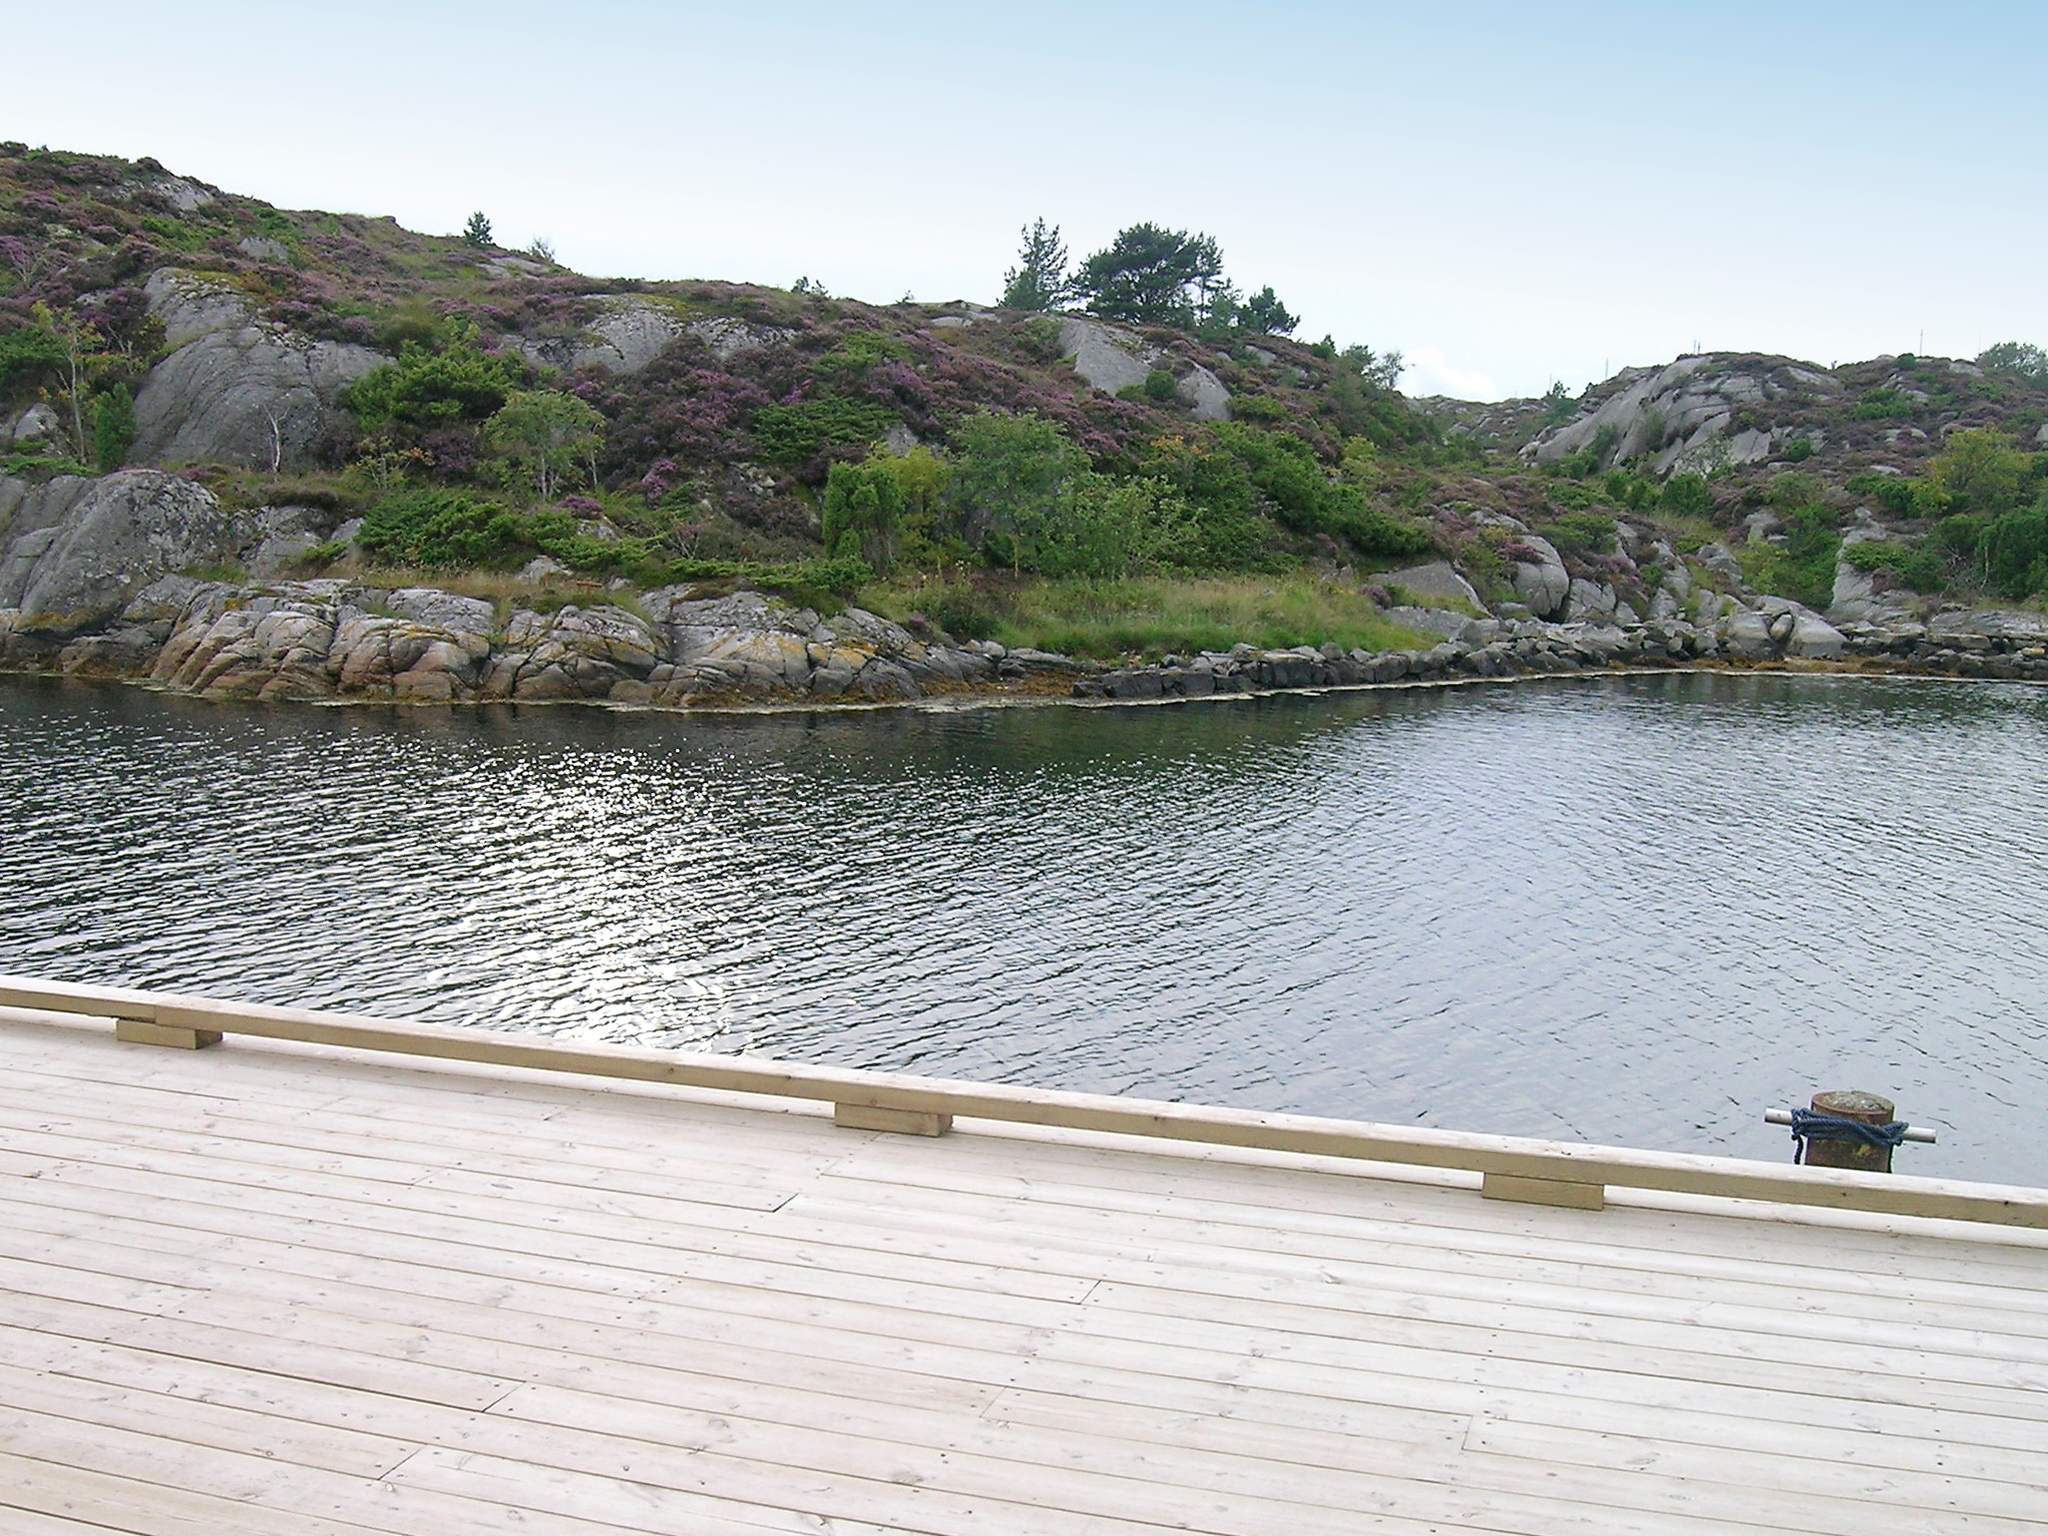 Ferienhaus Mølstrevåg (365130), Sveio, Hordaland - Hardangerfjord, Westnorwegen, Norwegen, Bild 20